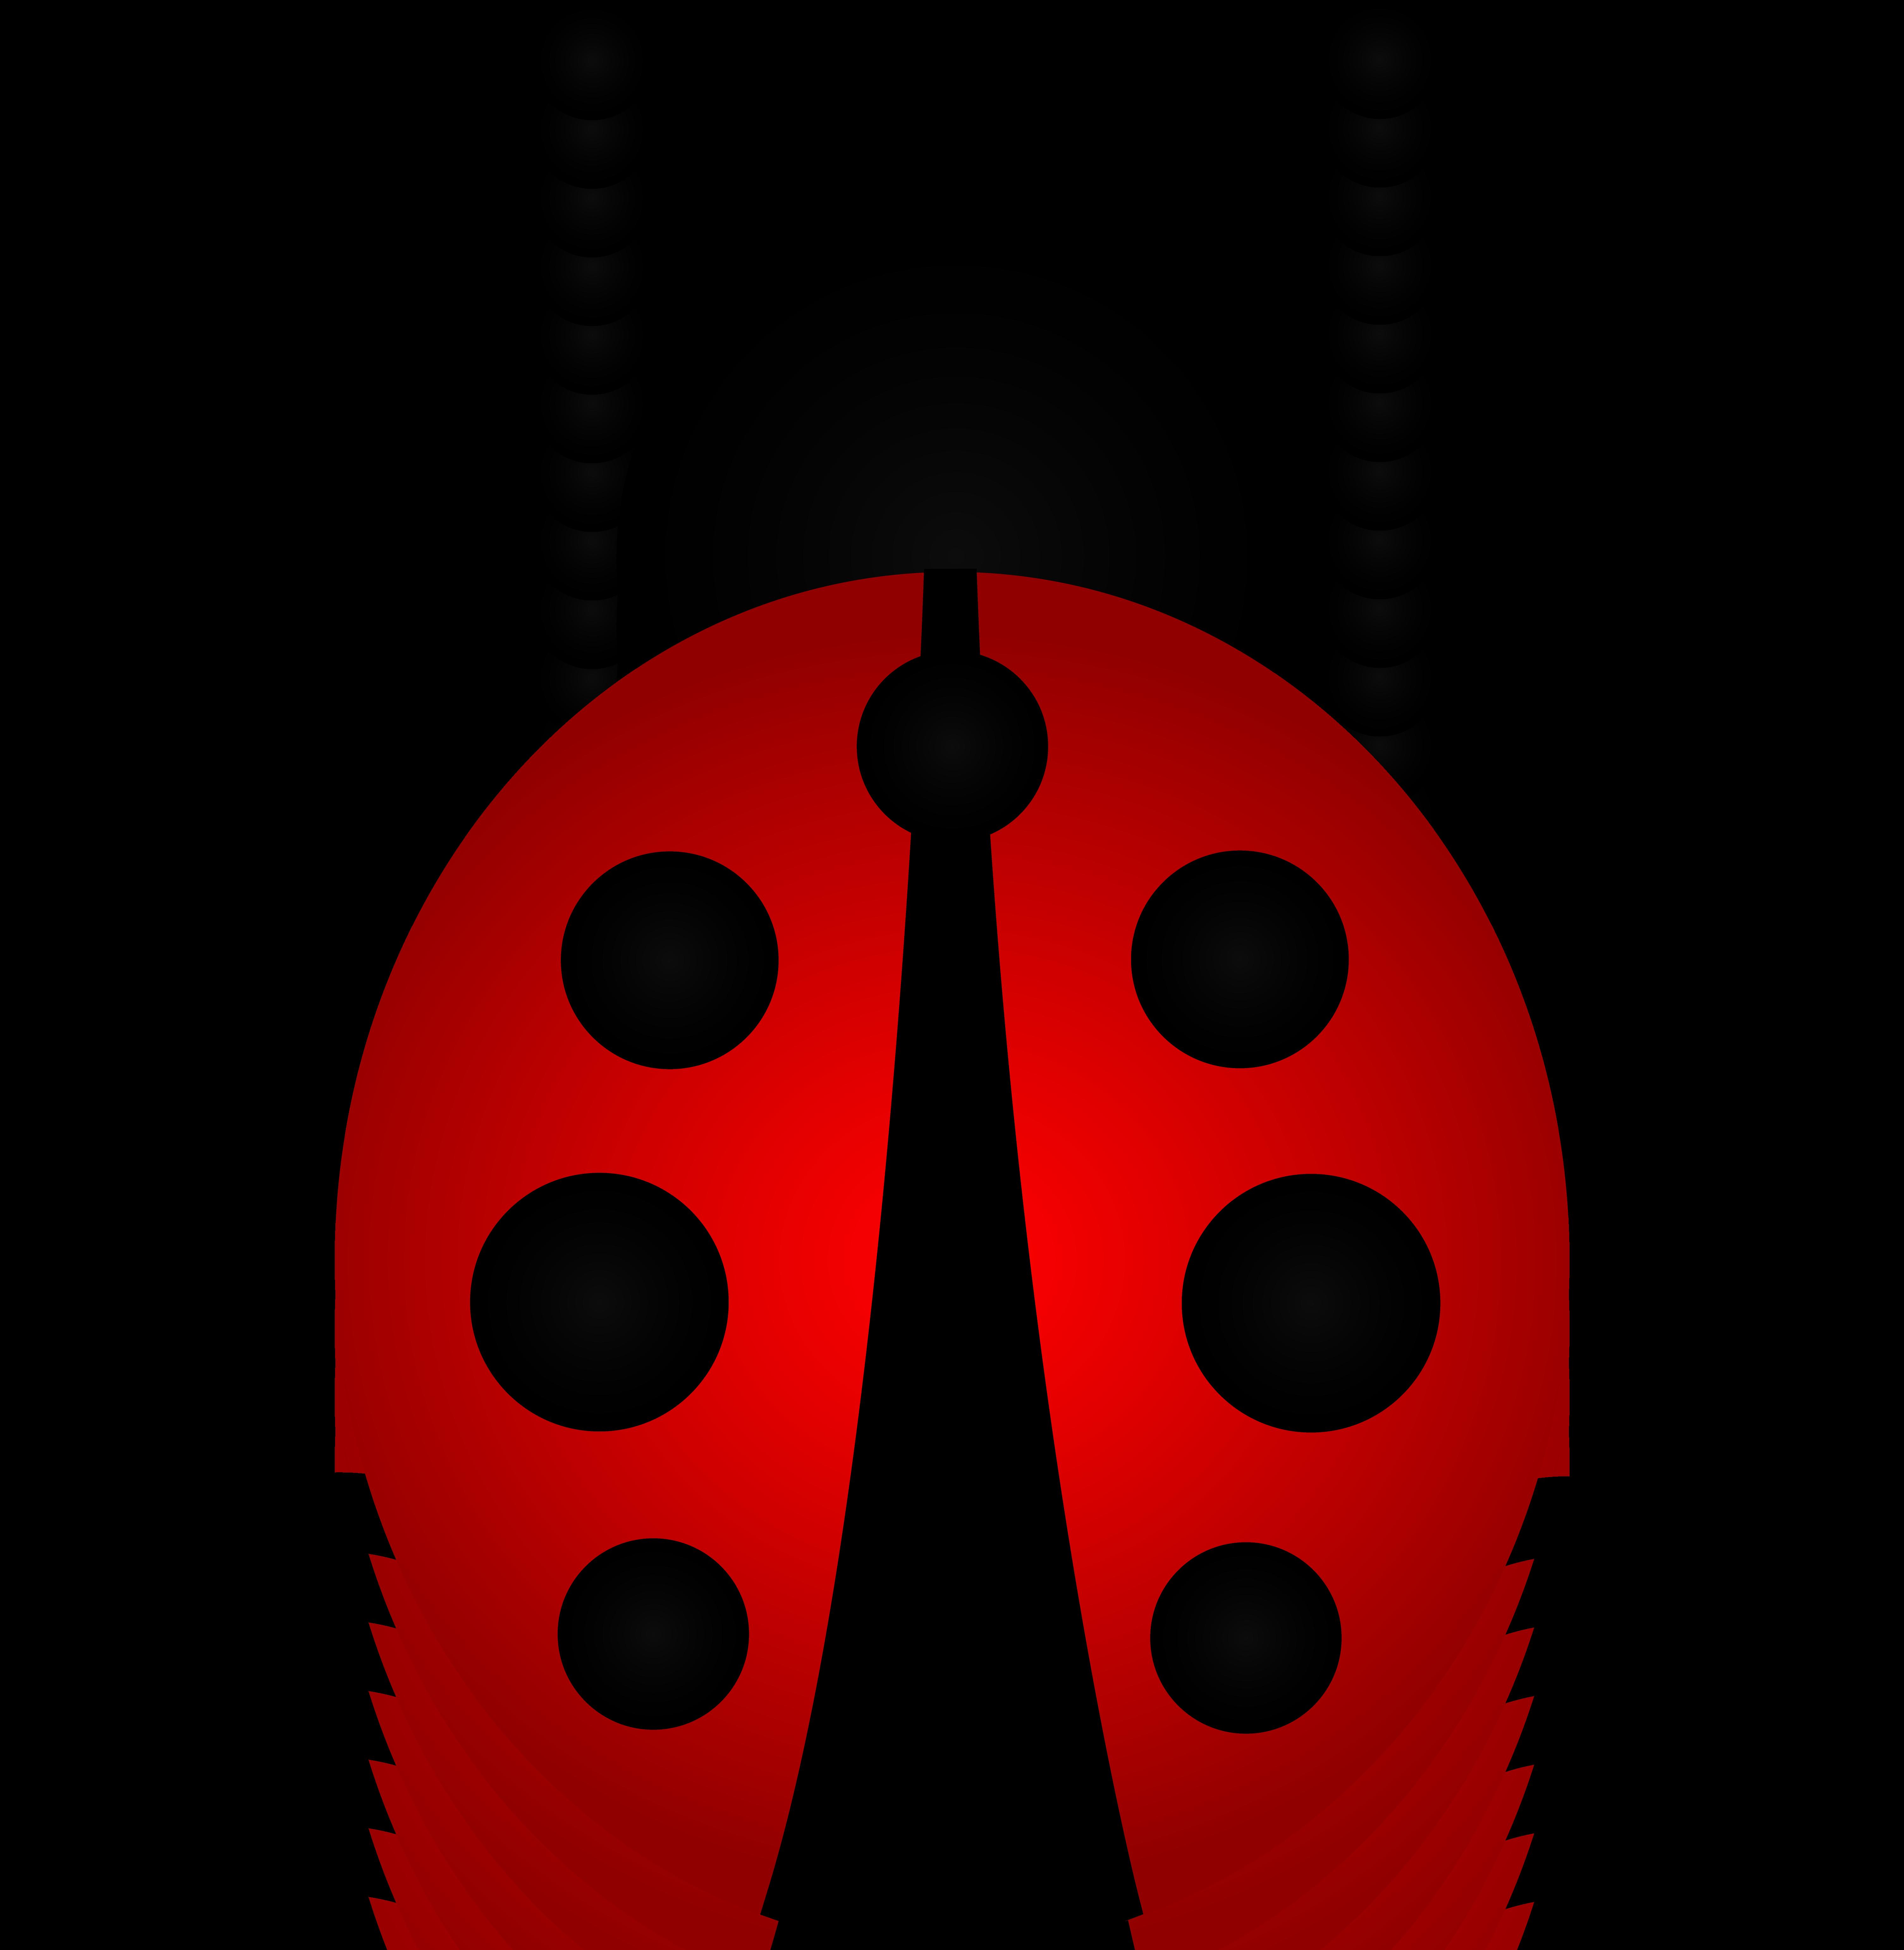 Breathtaking image intended for ladybug printable